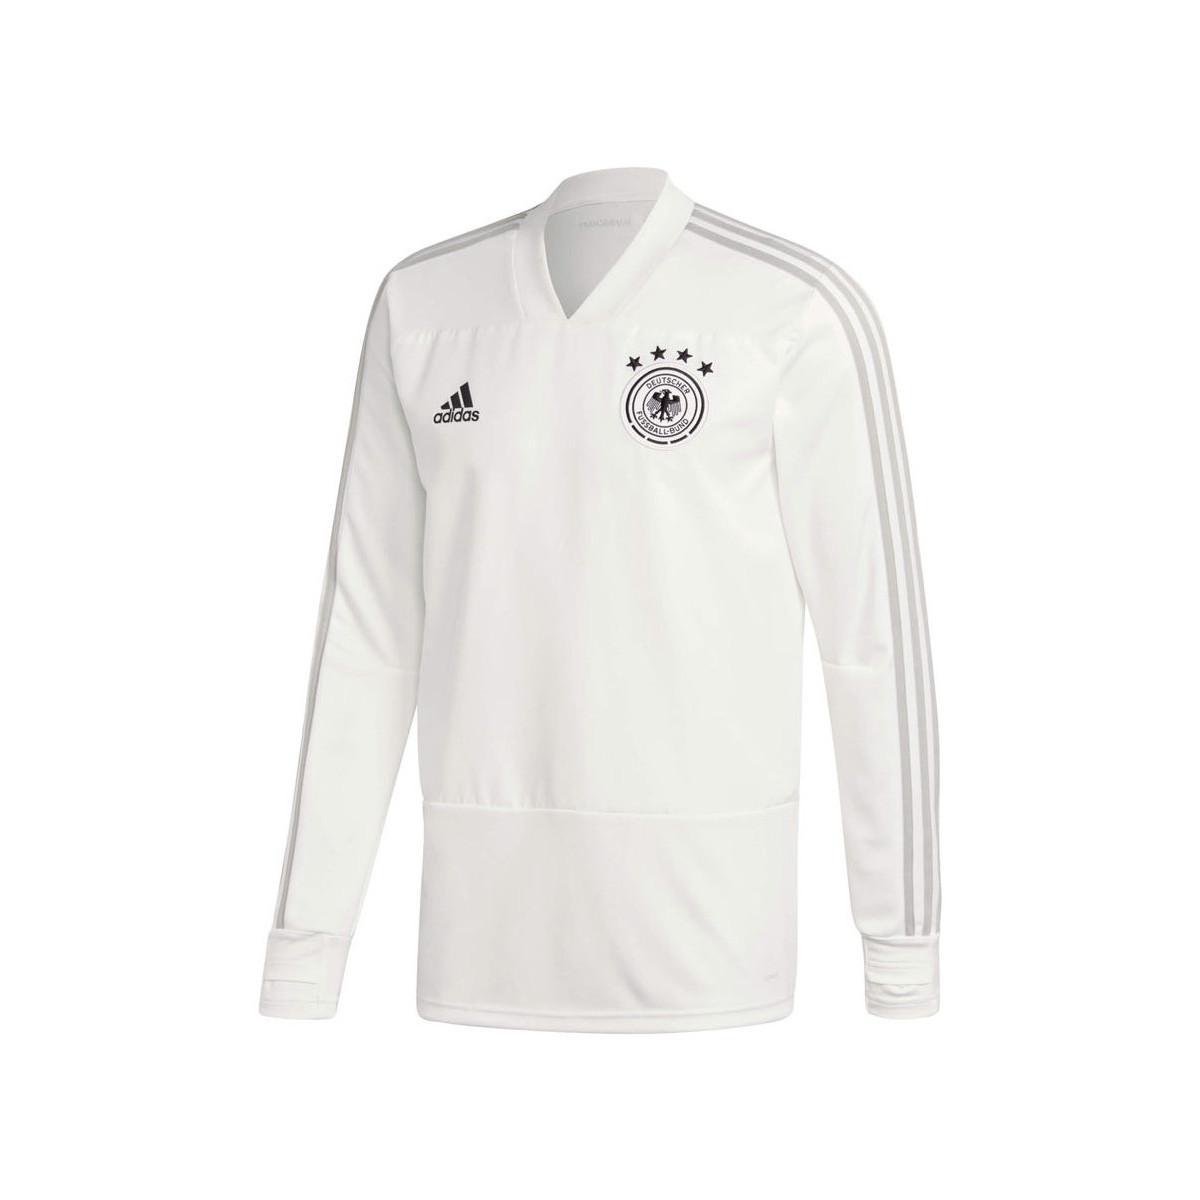 f8648775a adidas 2018-2019 Germany Training Top (pure) Men s Sweatshirt In ...